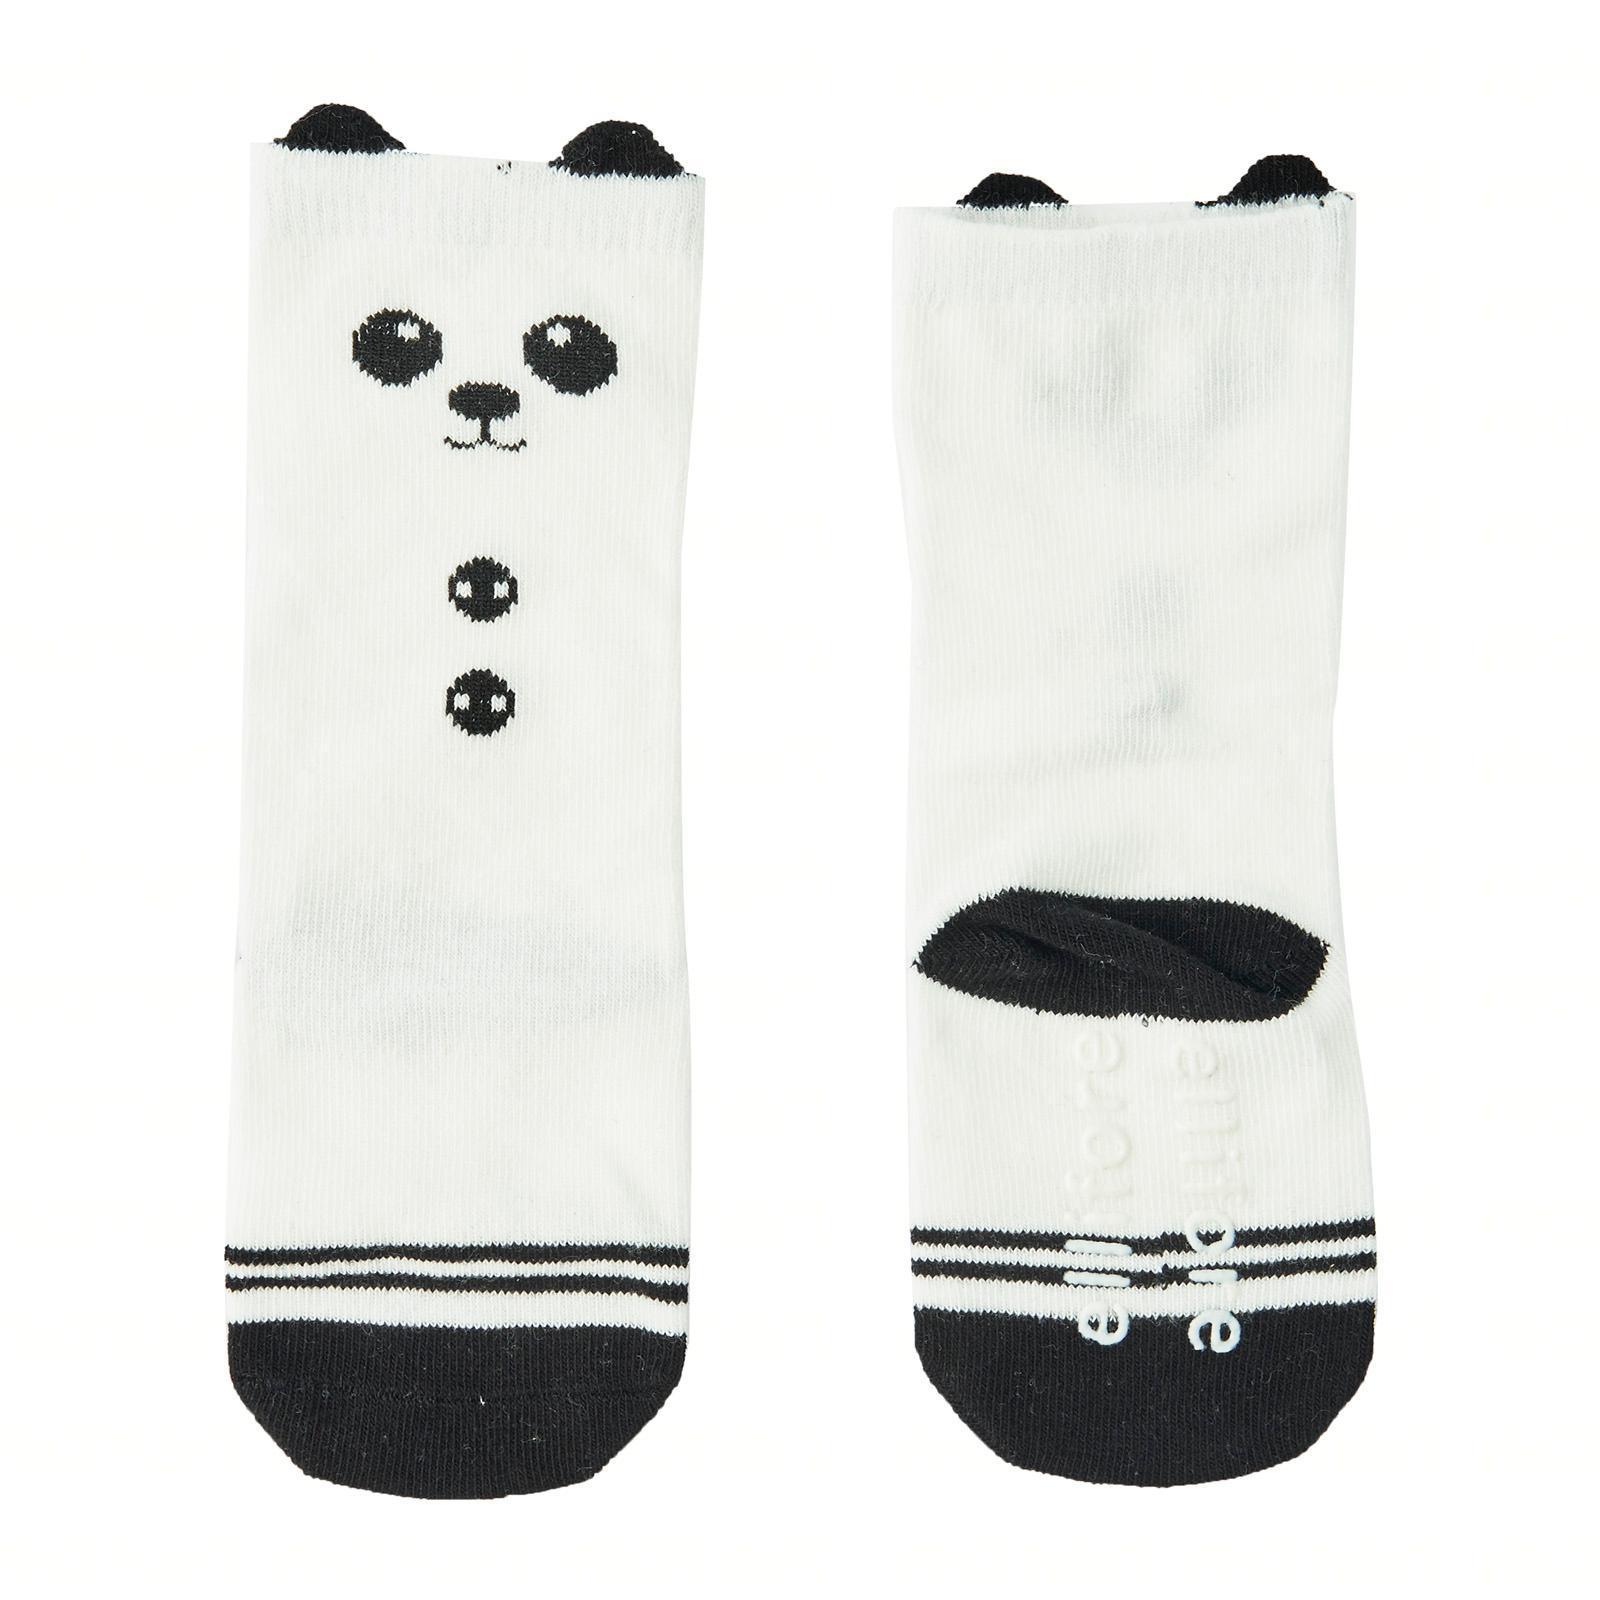 acd76ea30 My Babblings Animal Knee High Socks with Ears (Hello Panda in Toddler Size)